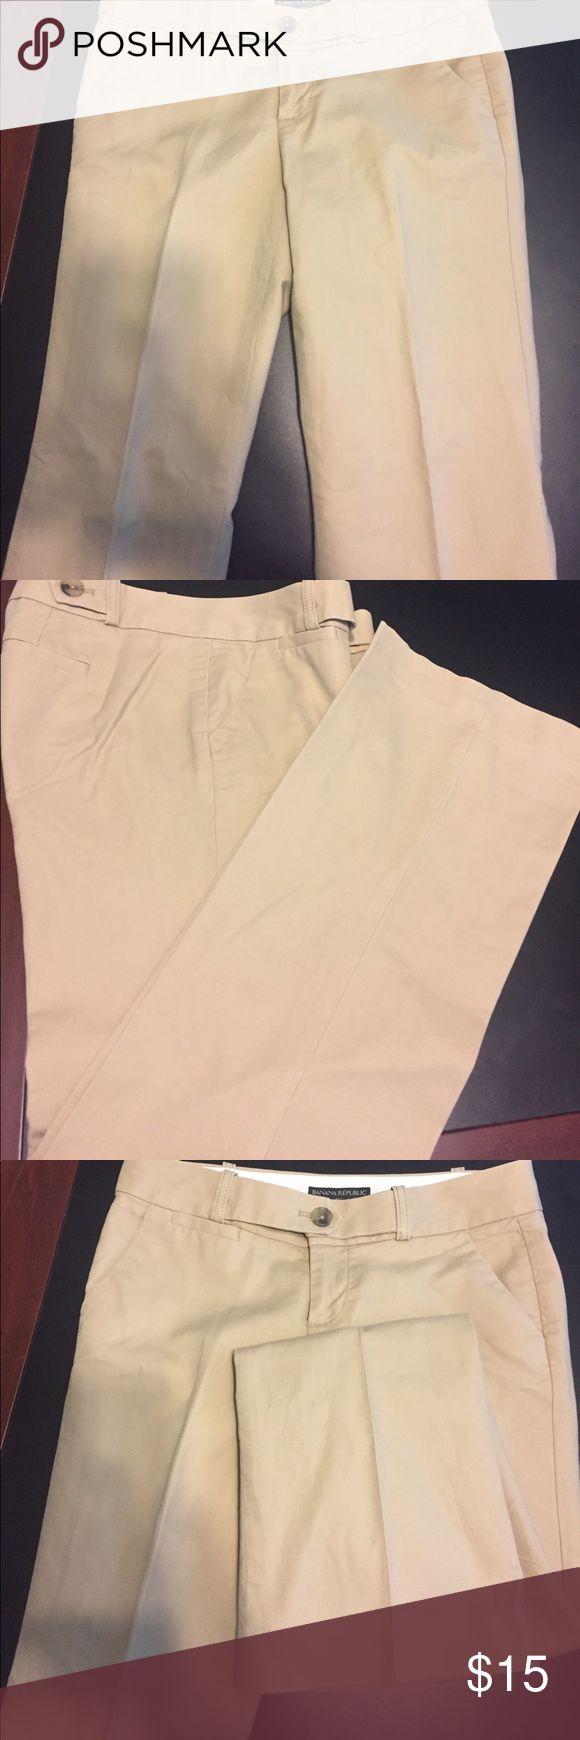 "Ladies Size 2 Banana Republic Trousers Size 2 Banana Republic Trousers  Pre-Loved Measurements Length 38.5"" waist 30"" Inseam 31"" Rise 7.5"" Banana Republic Pants Trousers"